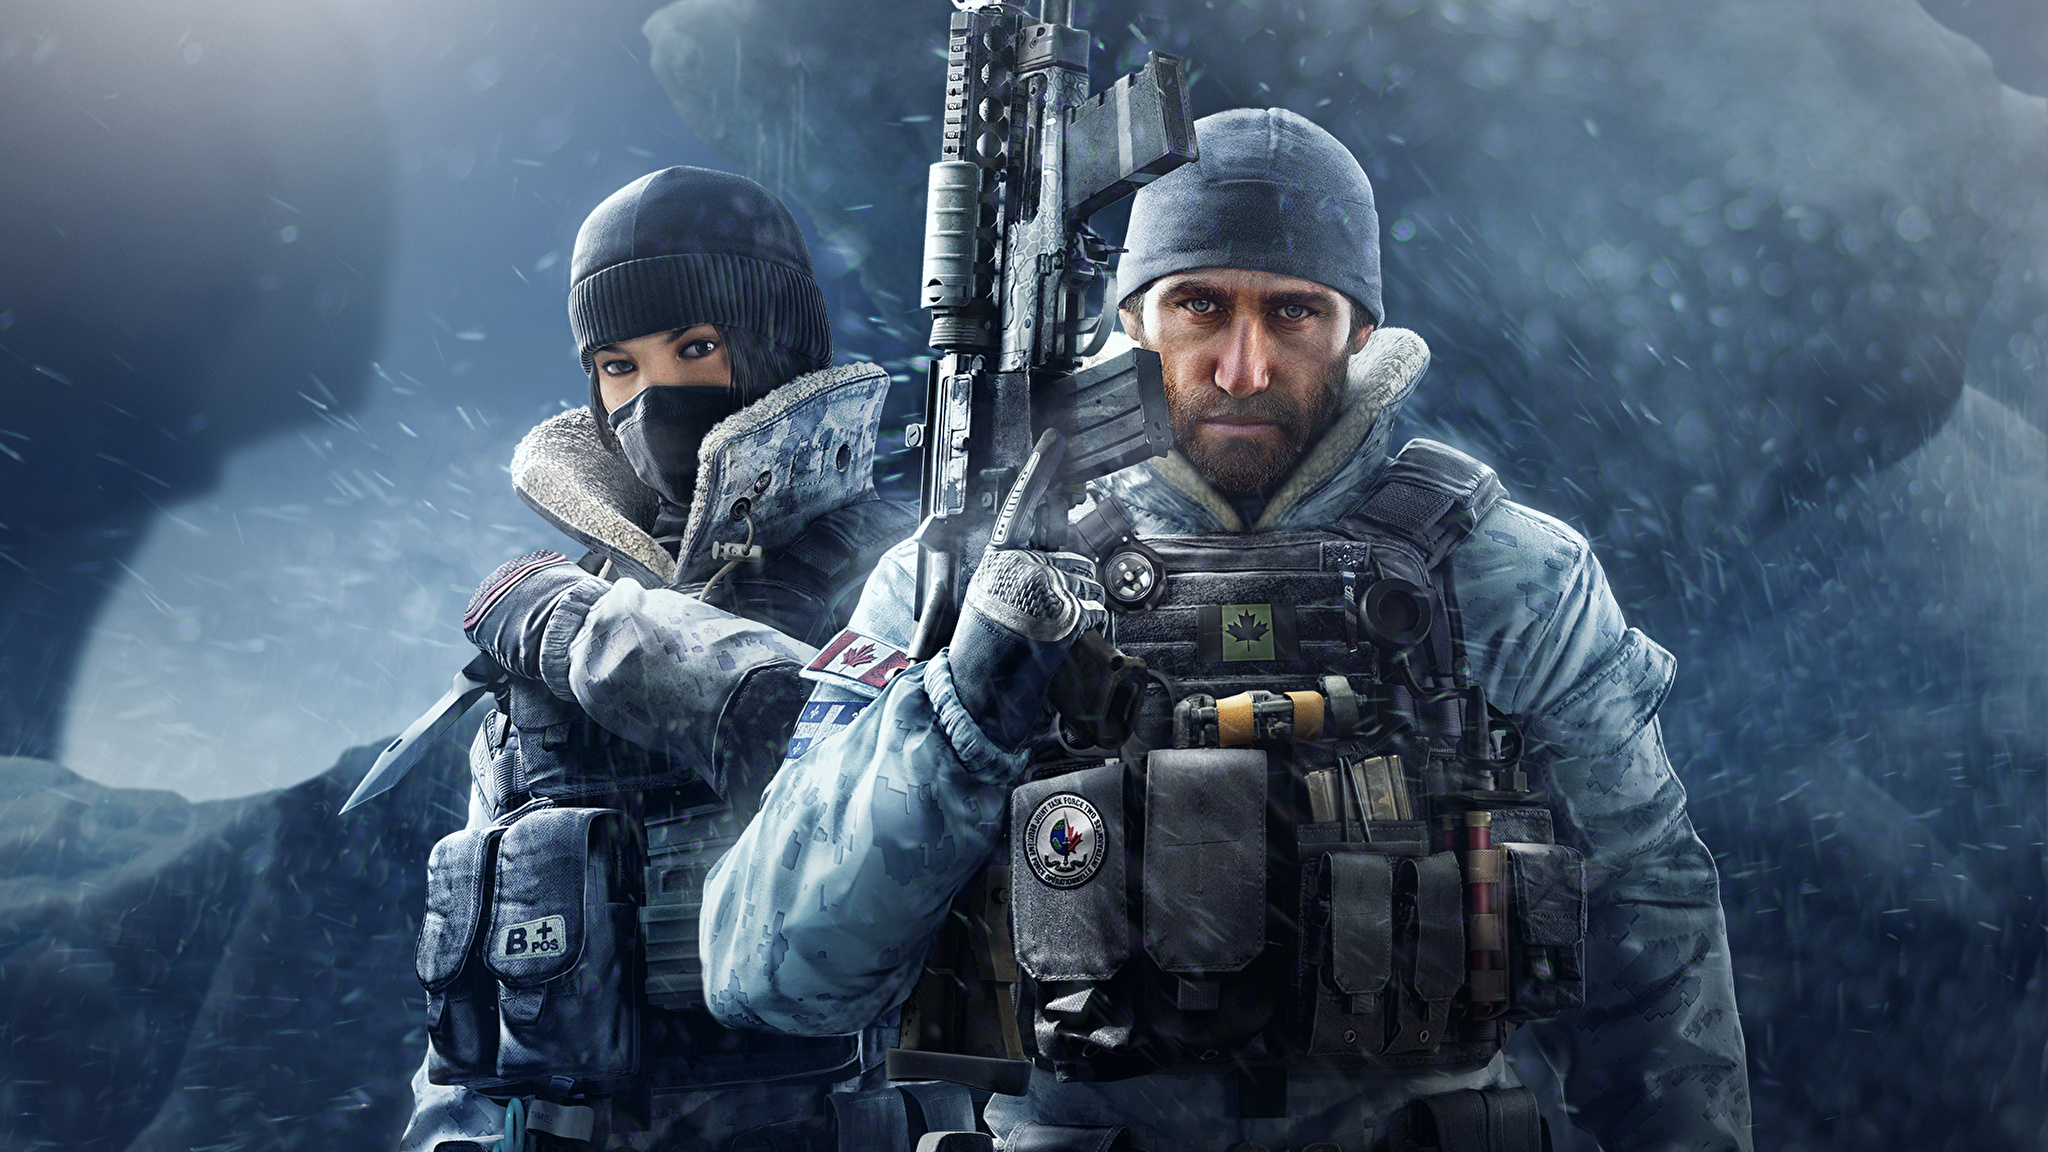 Wallpapers Tom Clancys Rainbow Six Siege Soldiers Assault 2048x1152 2048x1152